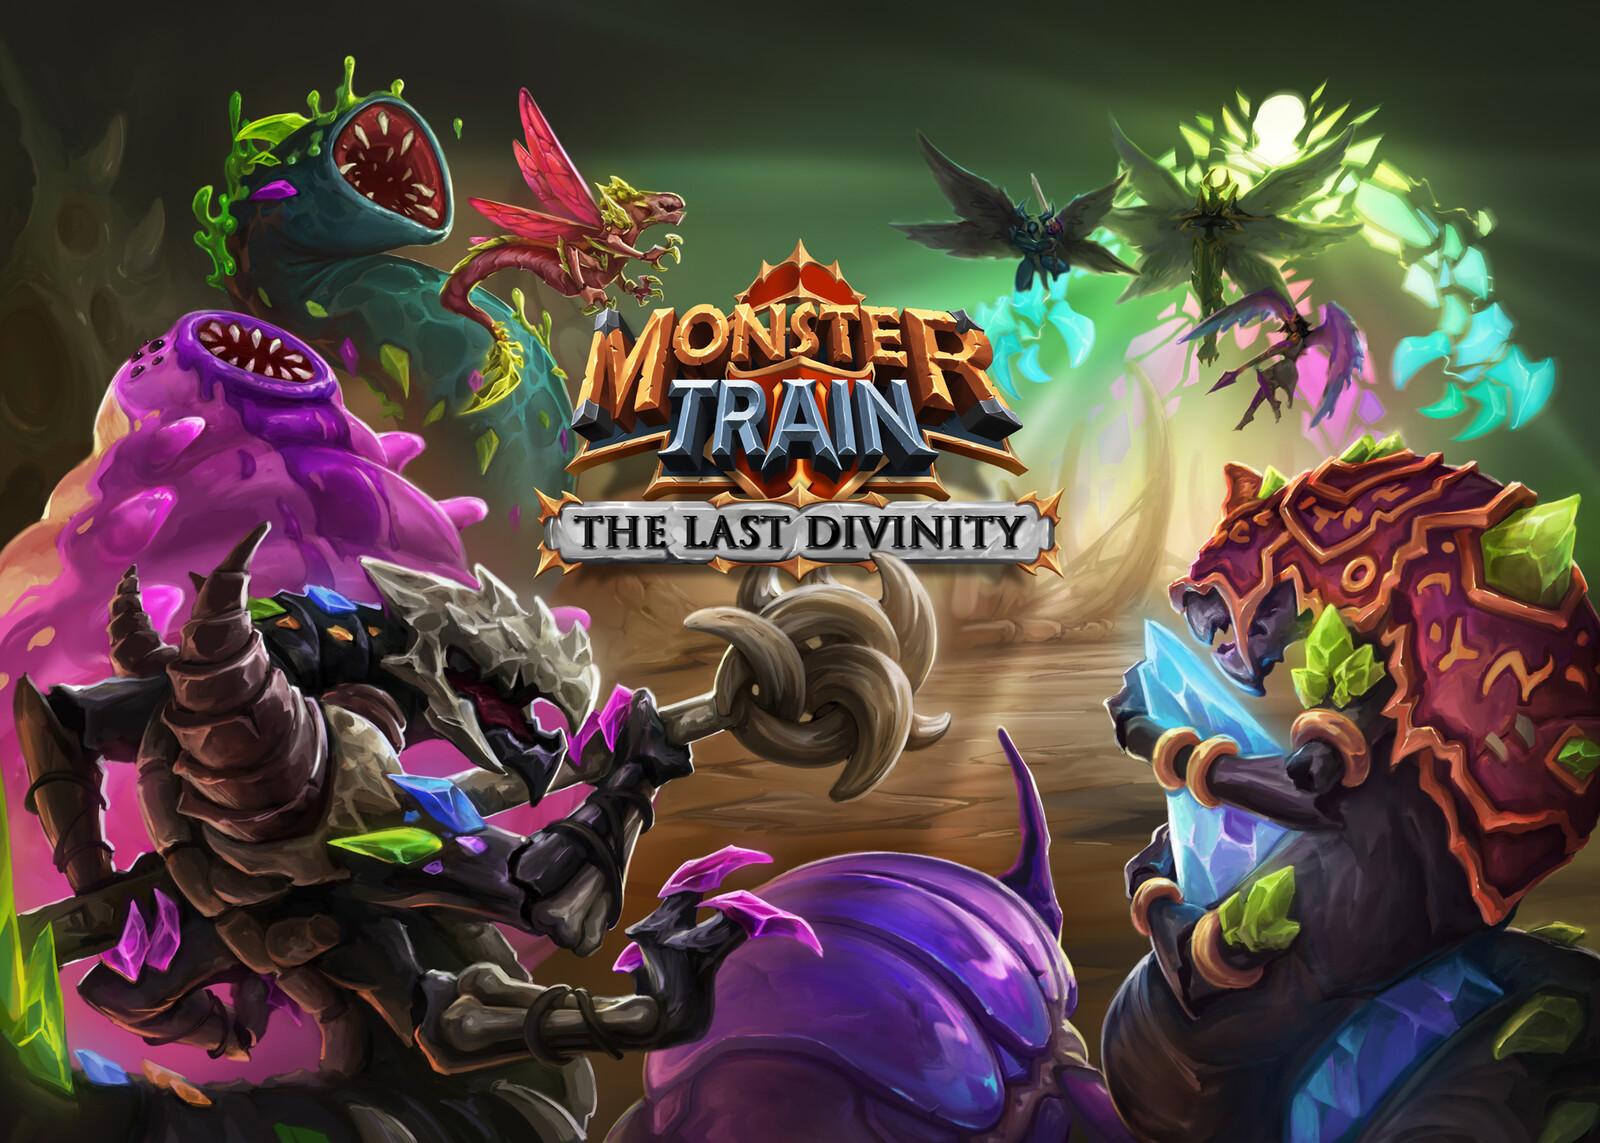 Monster Train: The Last Divinity